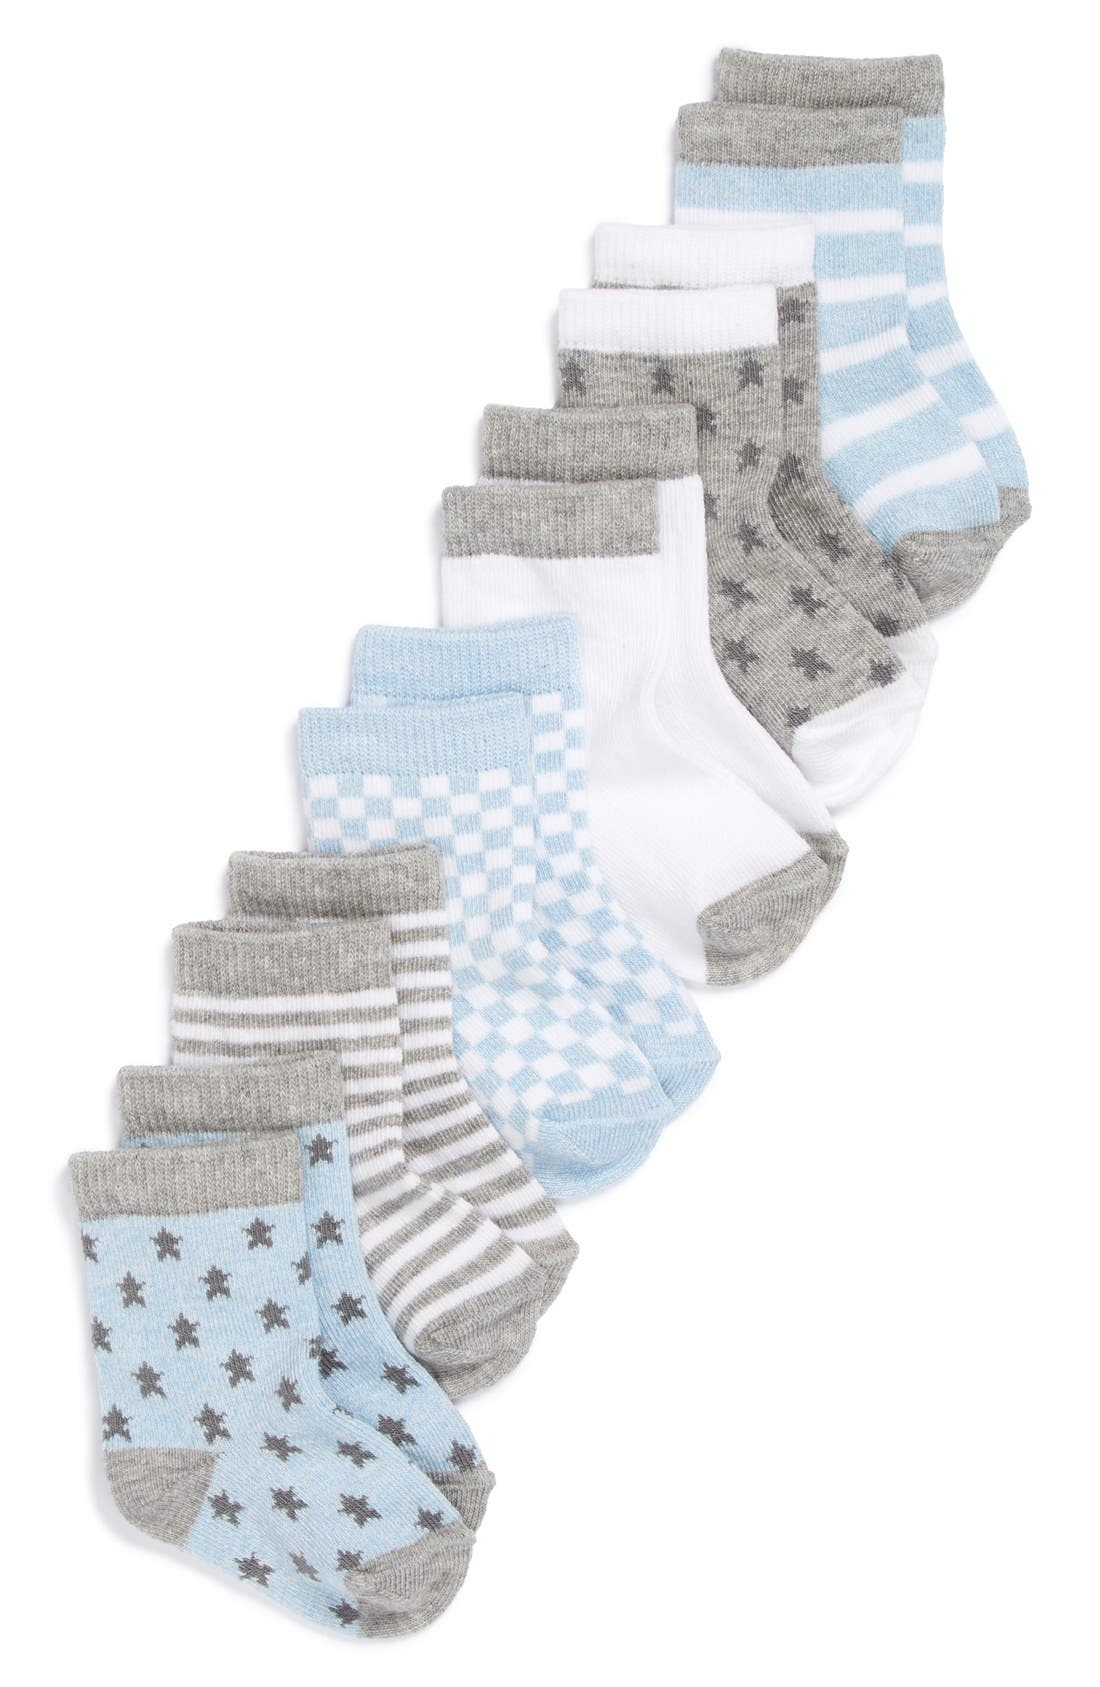 Crew Socks,                         Main,                         color, Blue Heather Pack